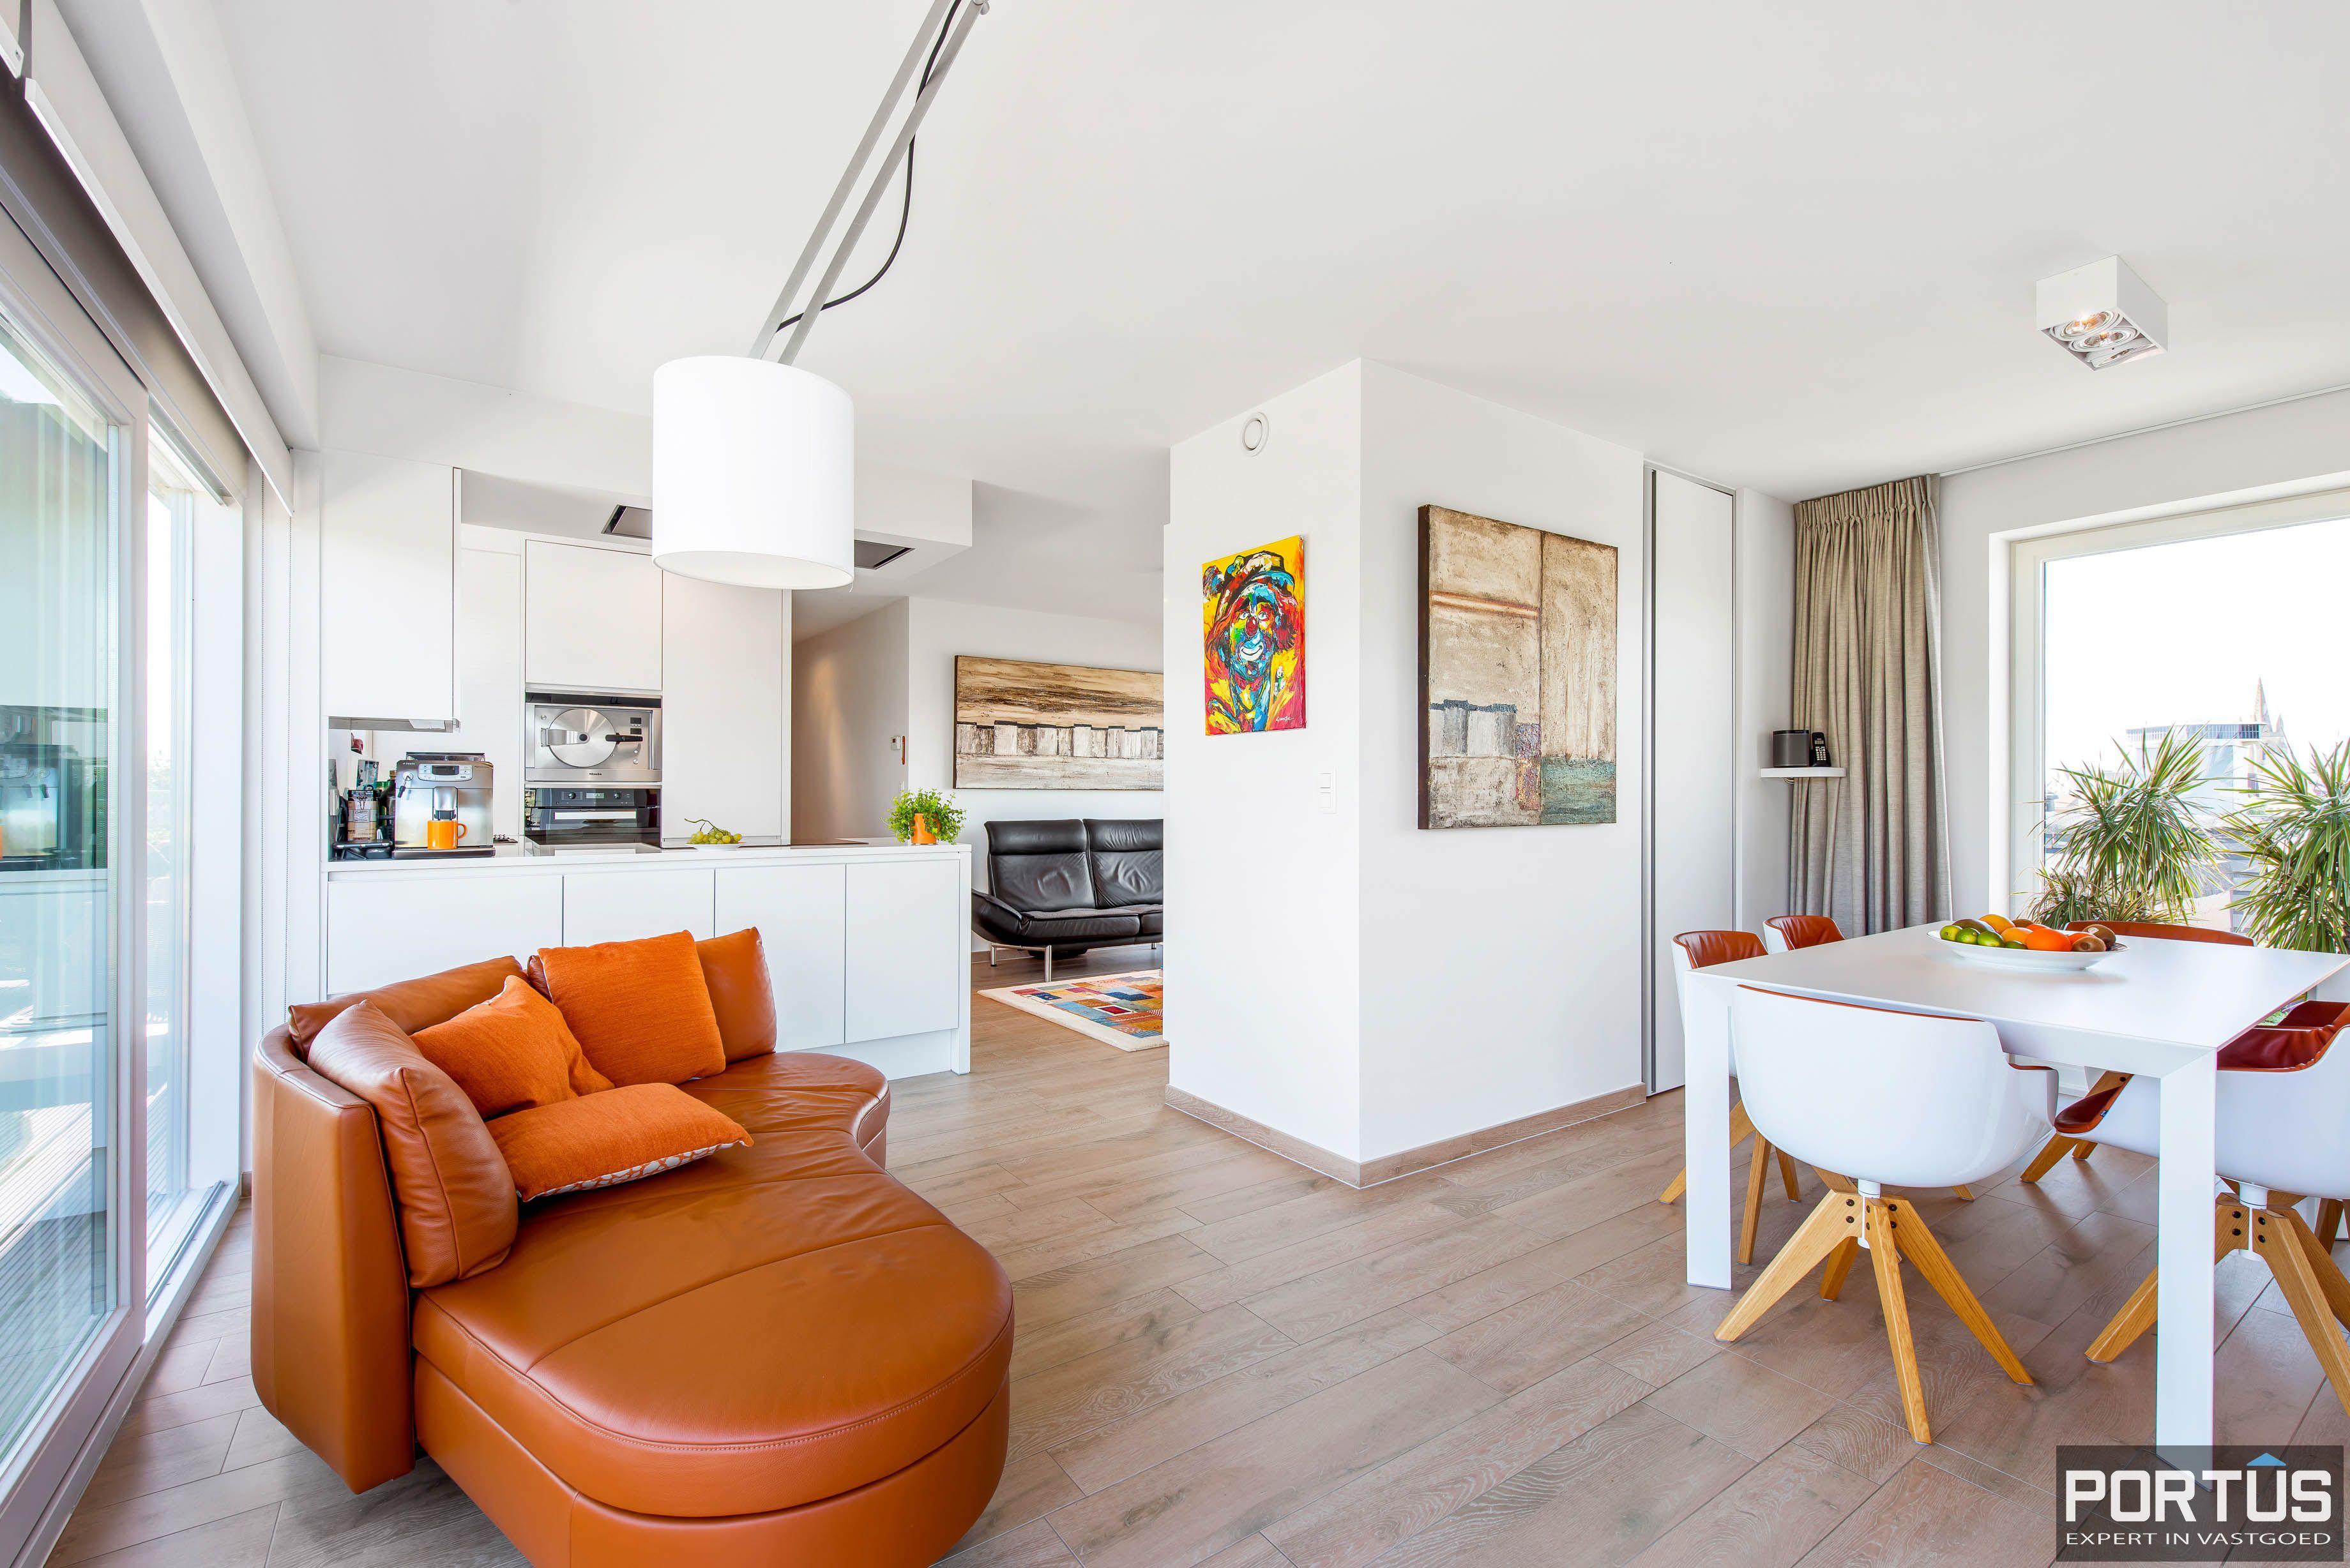 Exclusieve penthouse met 3 slaapkamers te koop te Nieuwpoort - 10942